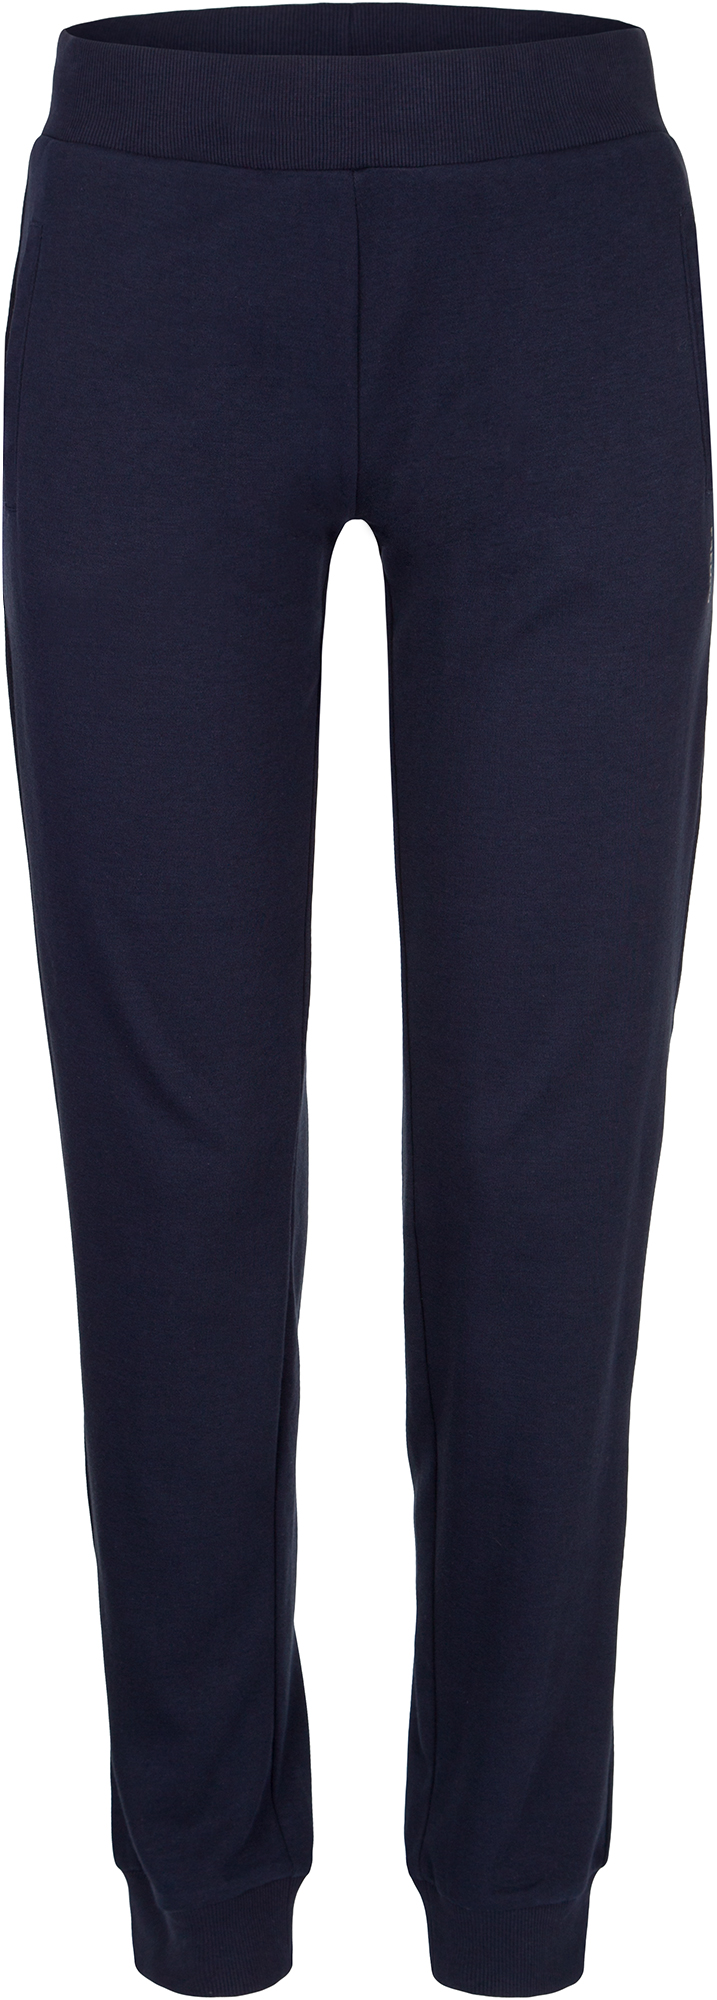 Freddy Брюки женские Freddy Basic Cotton, размер 48-50 цены онлайн